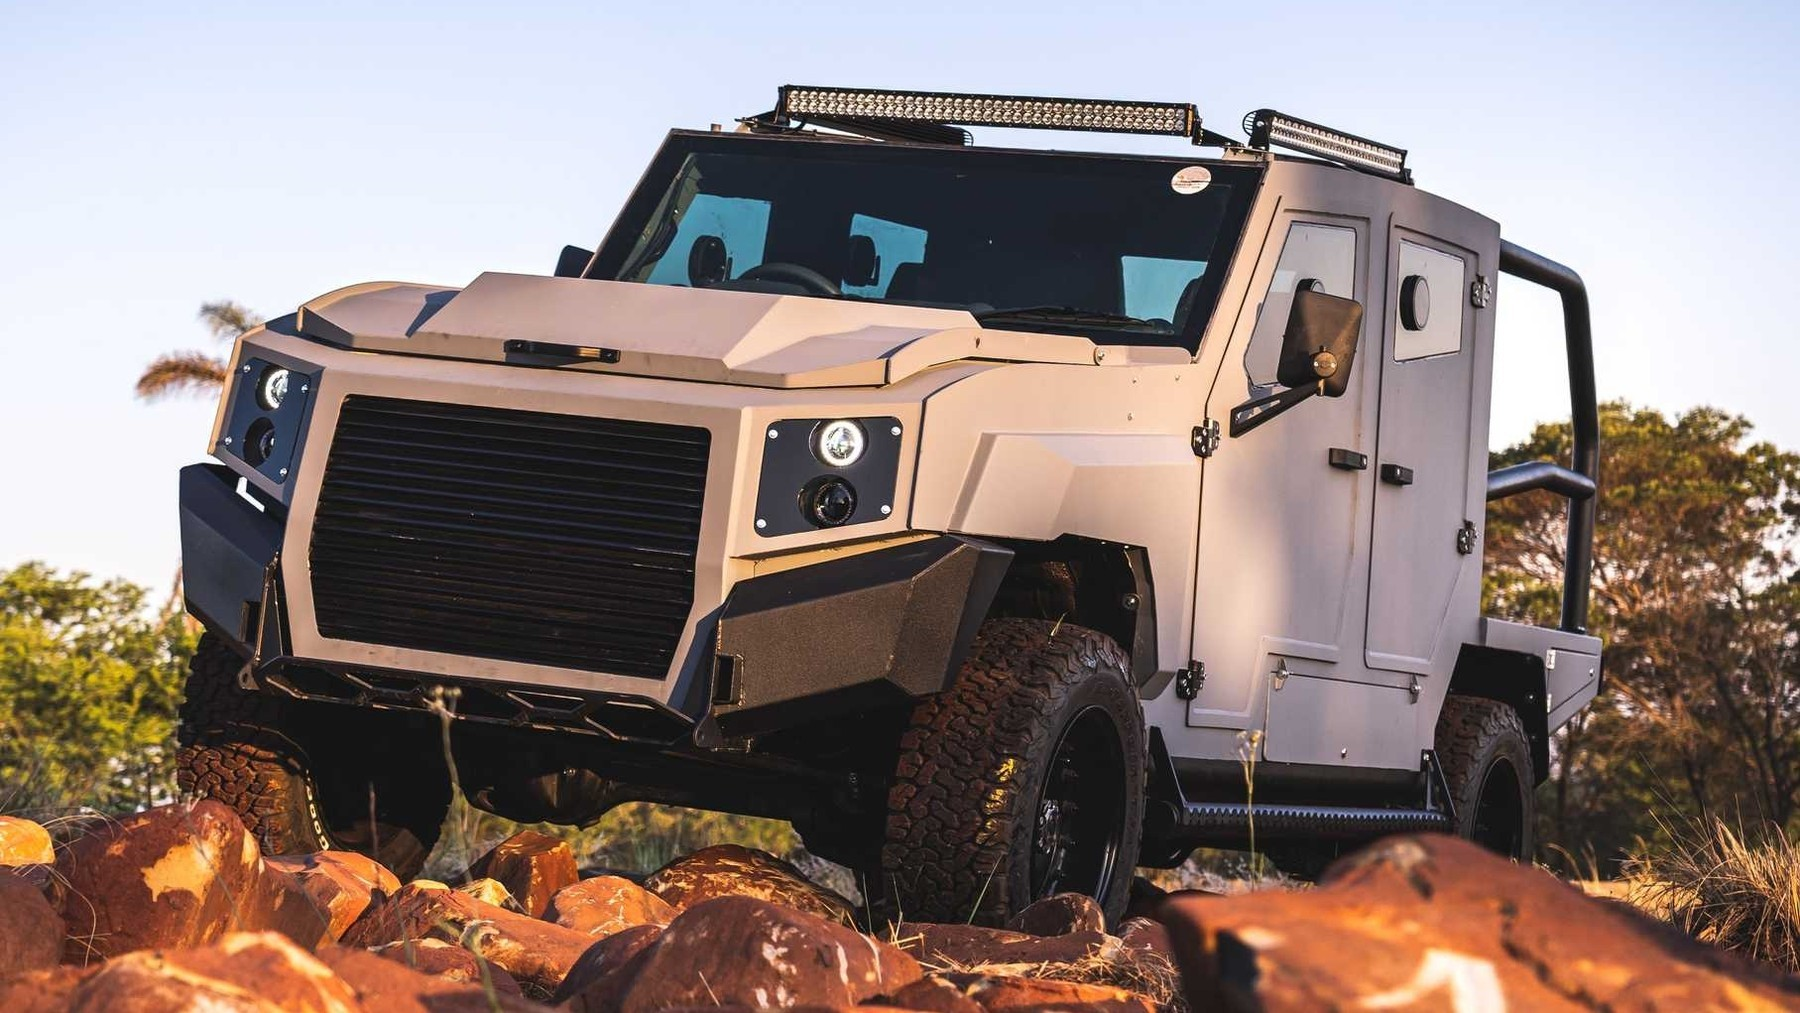 Сурово, по-африкански: броневик SVI MAX 3 на базе Toyota Land Cruiser 79